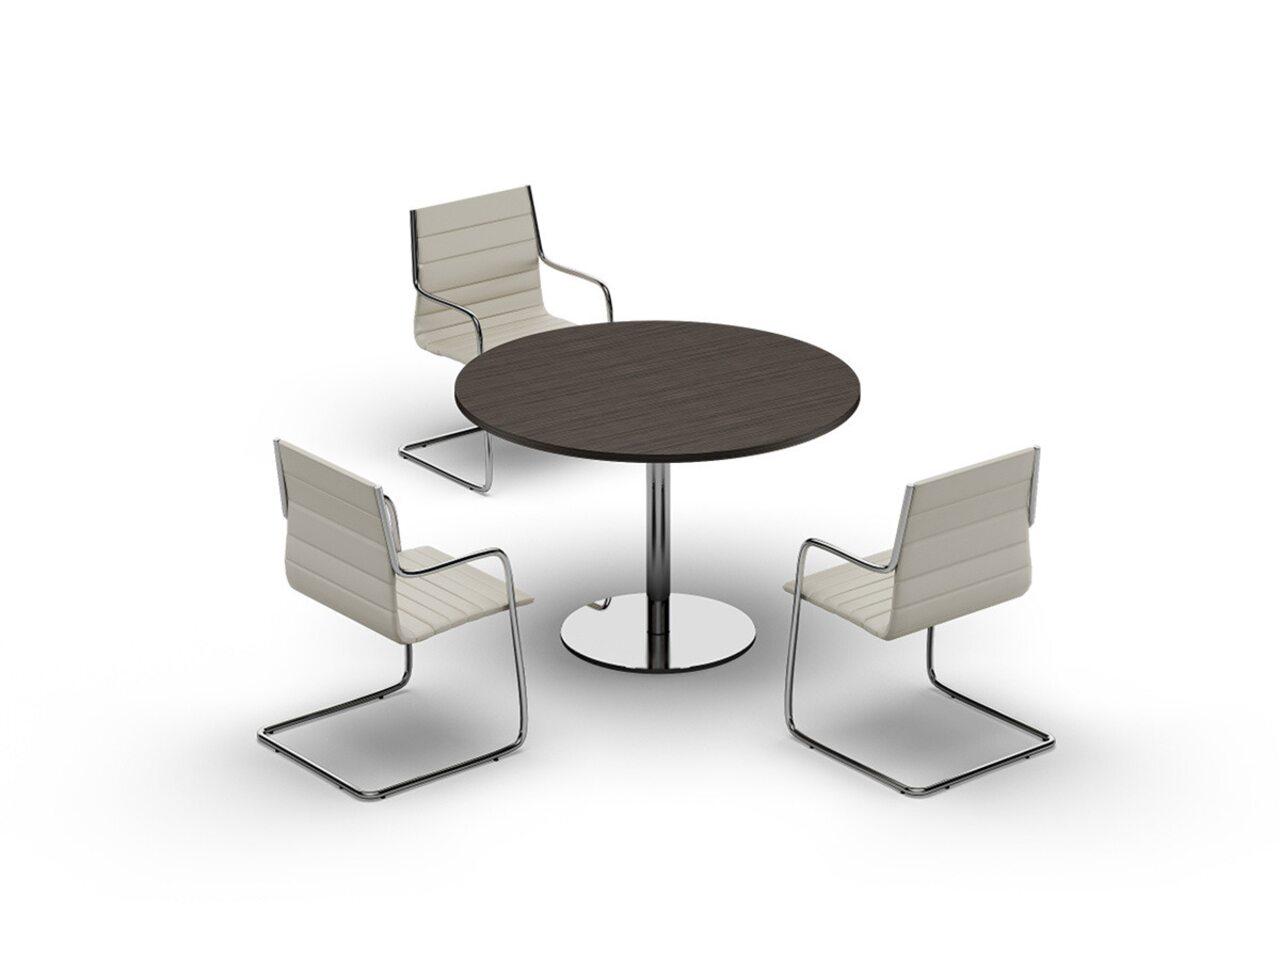 Стол для переговоров Orbis-Carre Meeting - фото 6